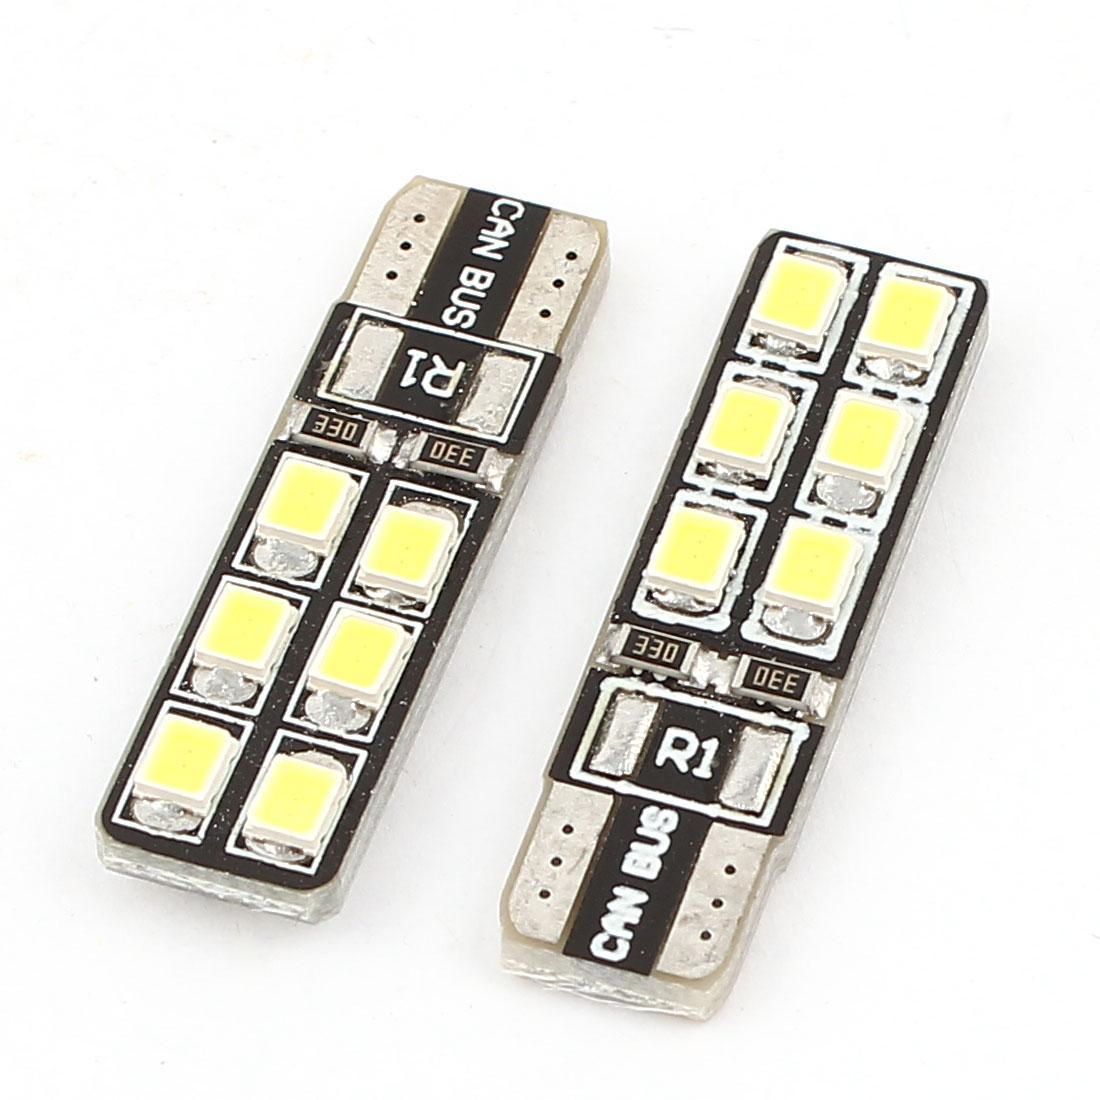 Car T10 194 161 192 W5W White 3528 SMD 12 LED Bulb Wedge Light Lamp Pair Internal